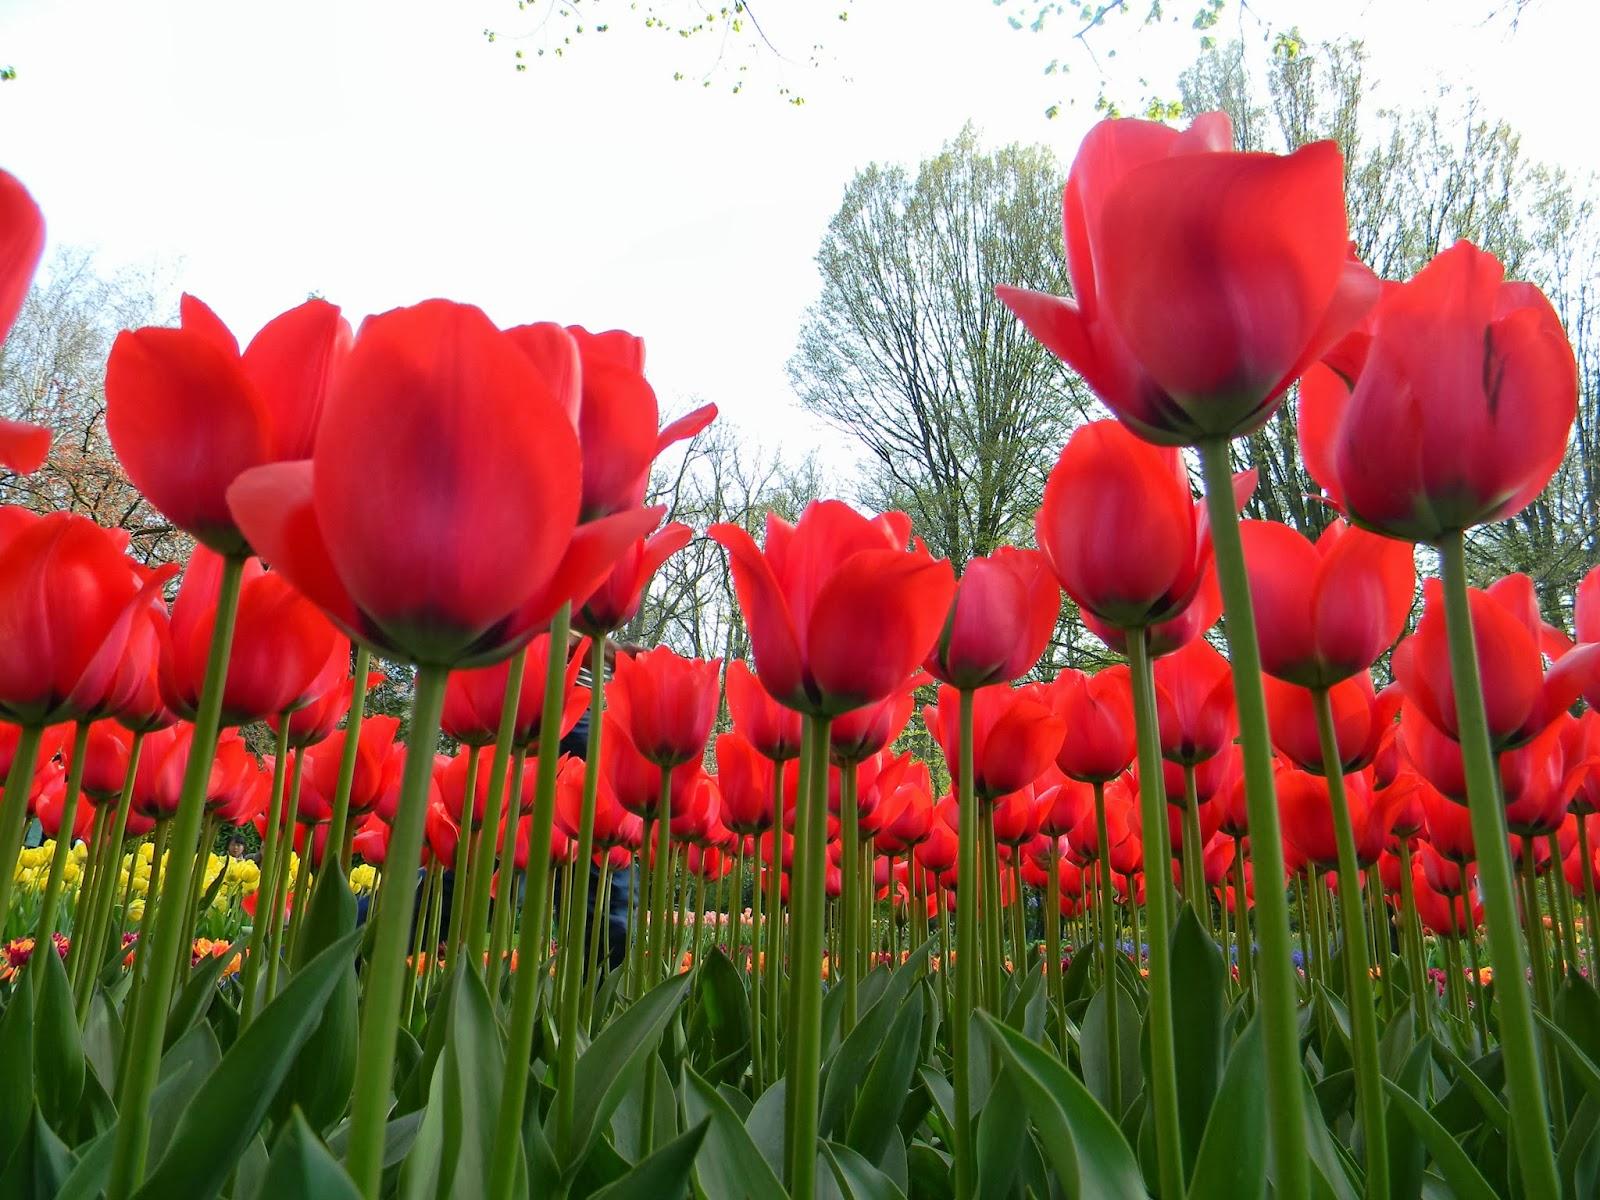 Gambar Taman Bunga Tulip